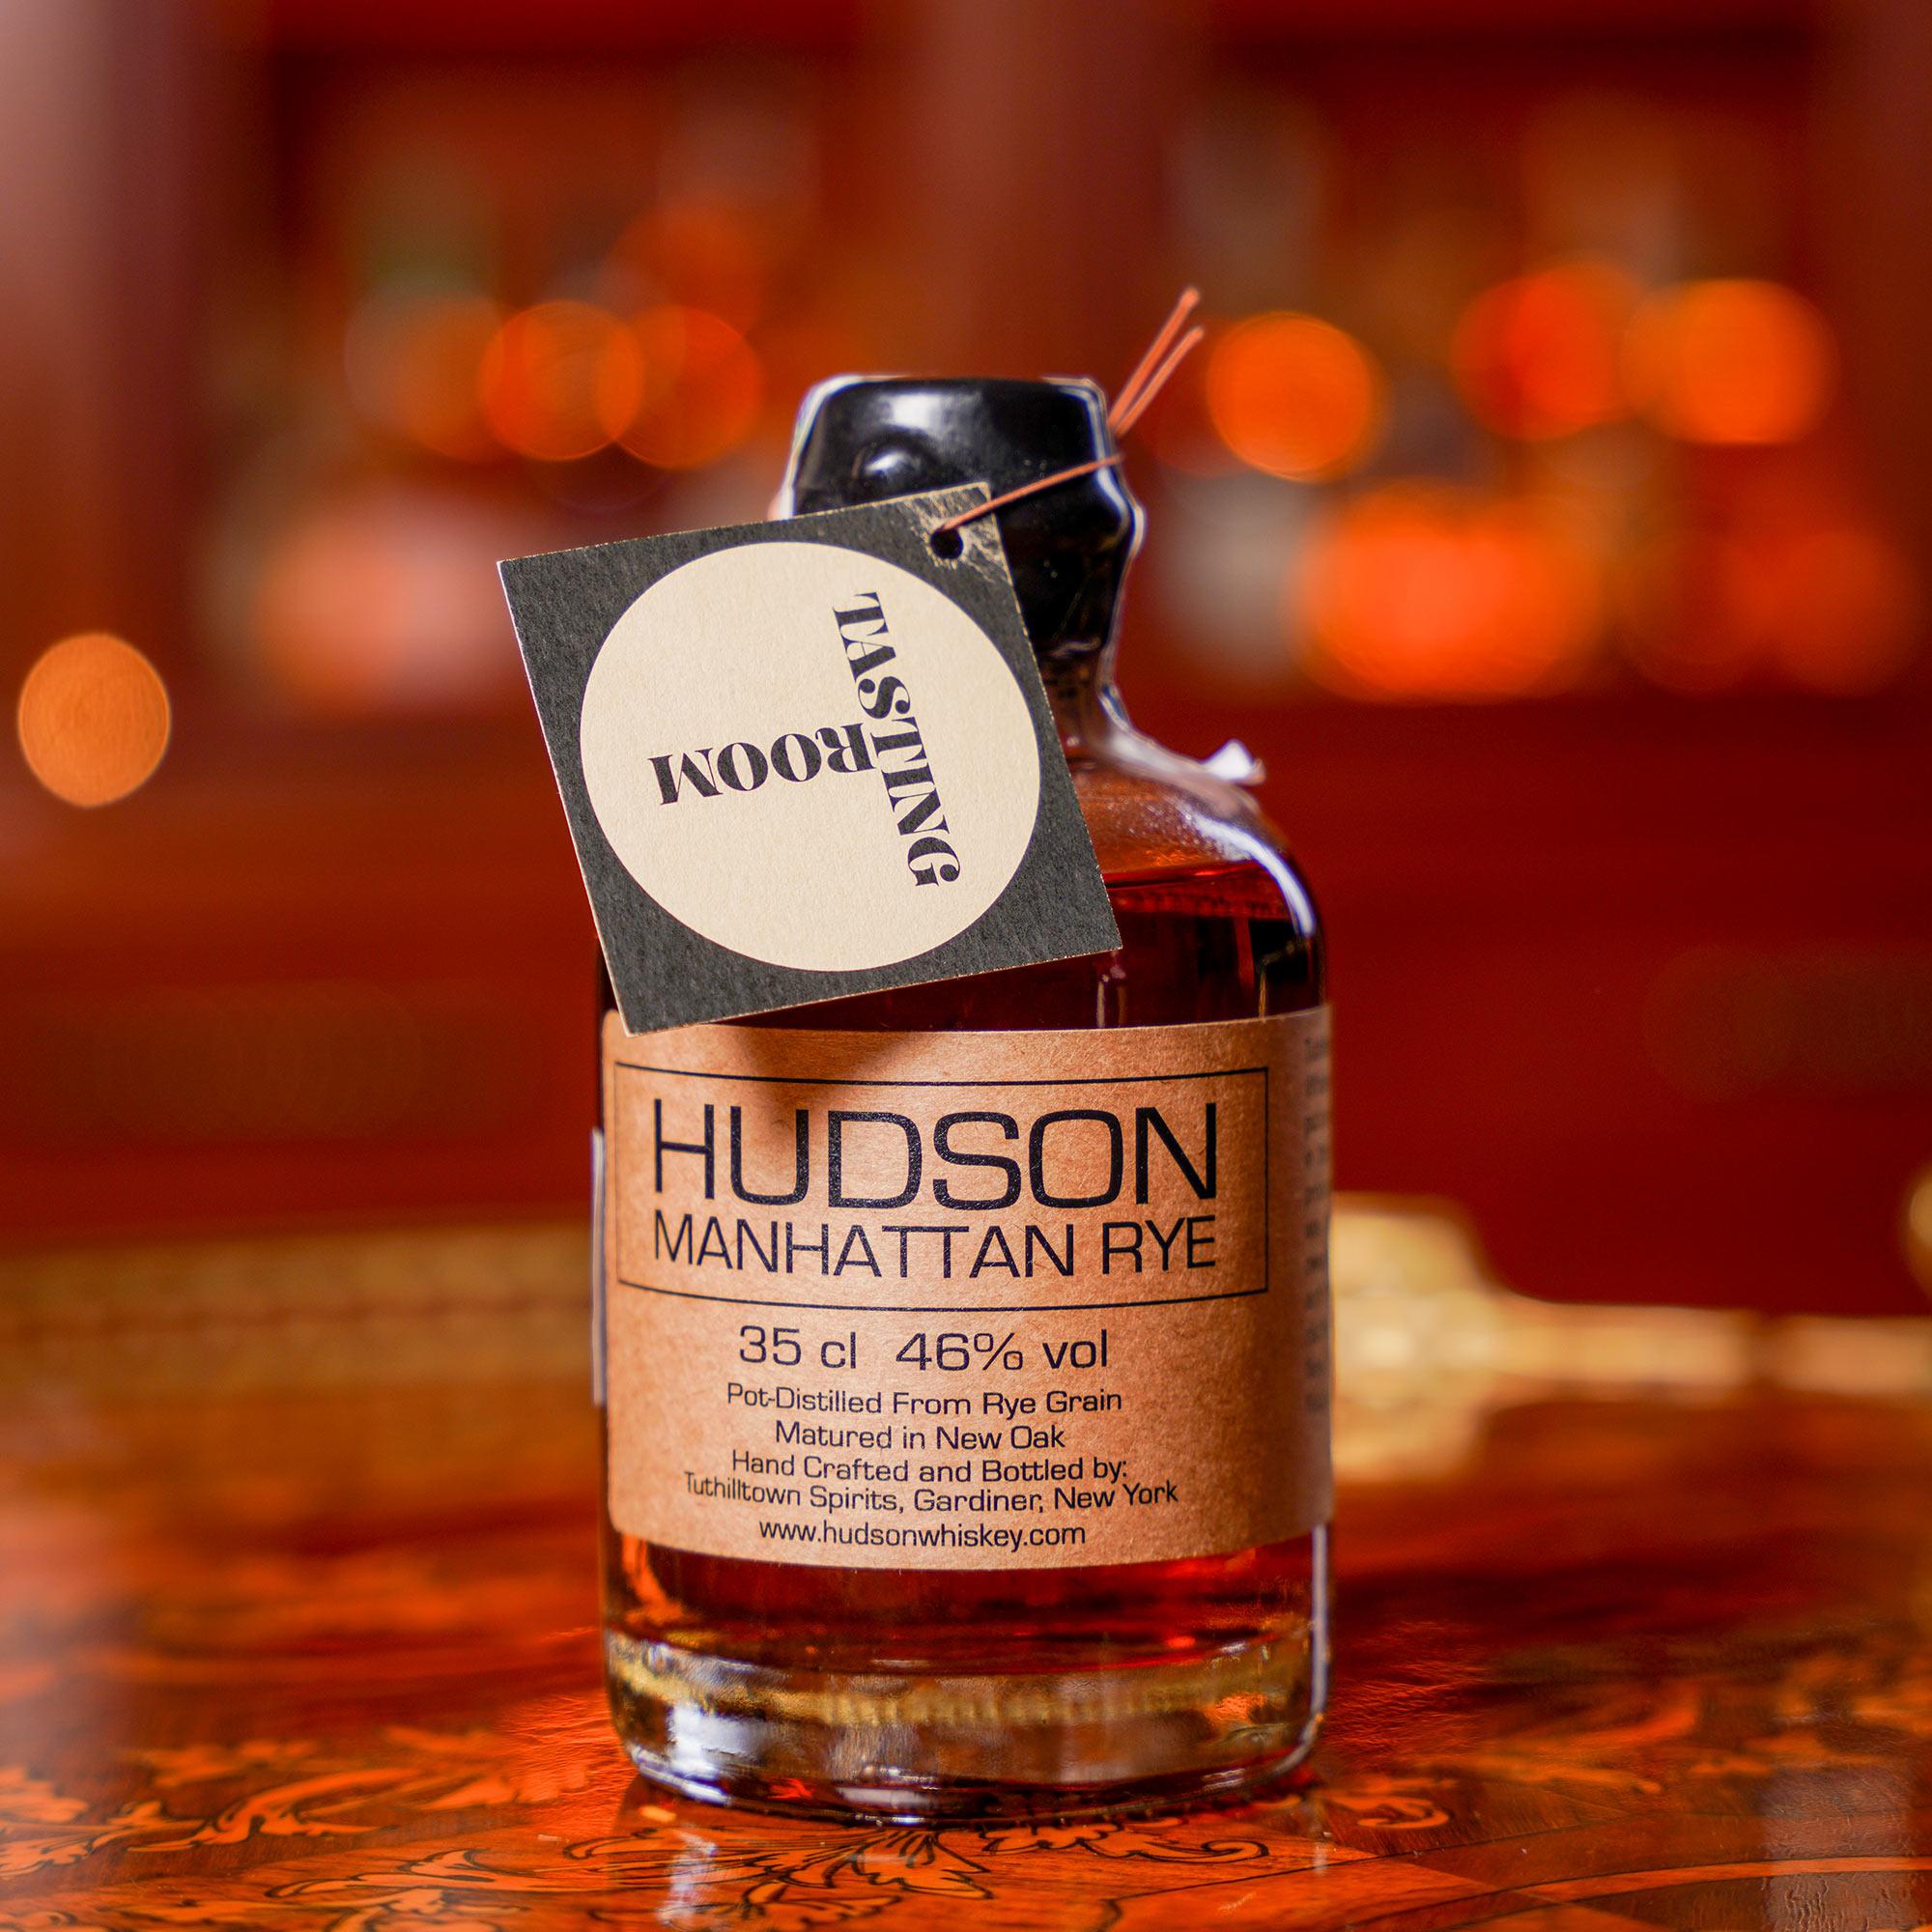 Hudson Manhattan Rye /Хъдсън Манхатън Рай